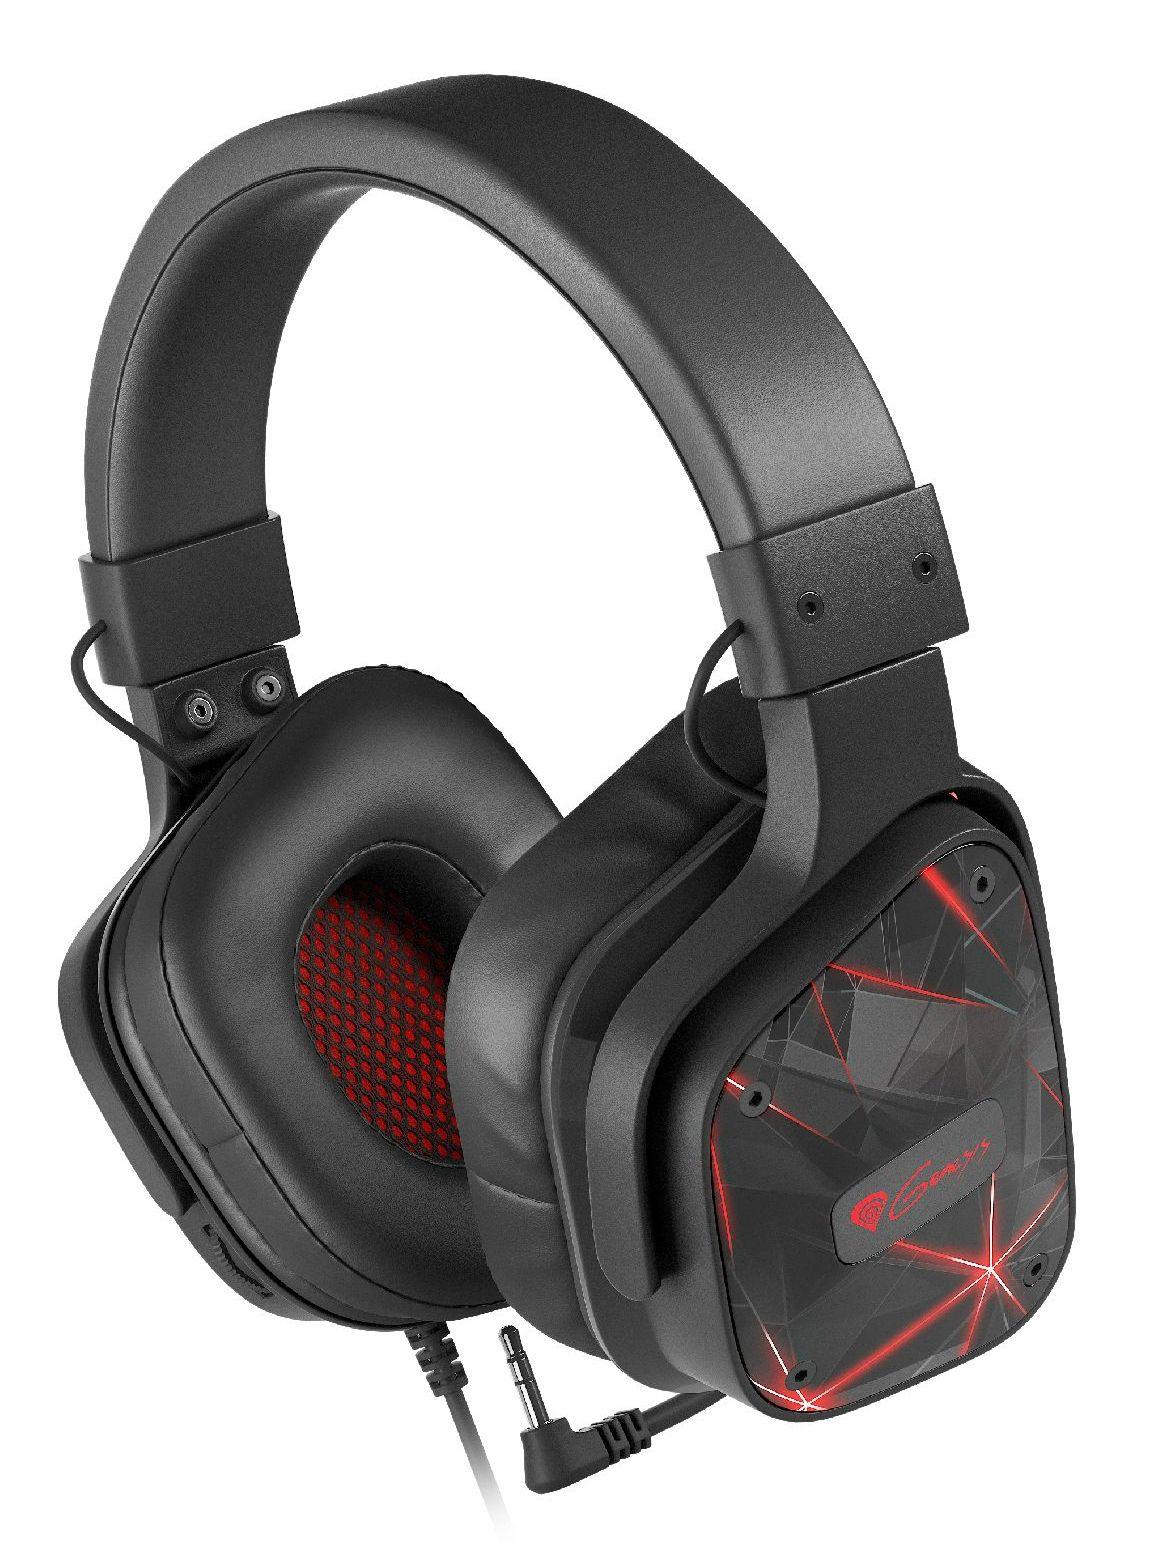 Гейминг слушалки с микрофон Genesis - Argon 570, черни - 4